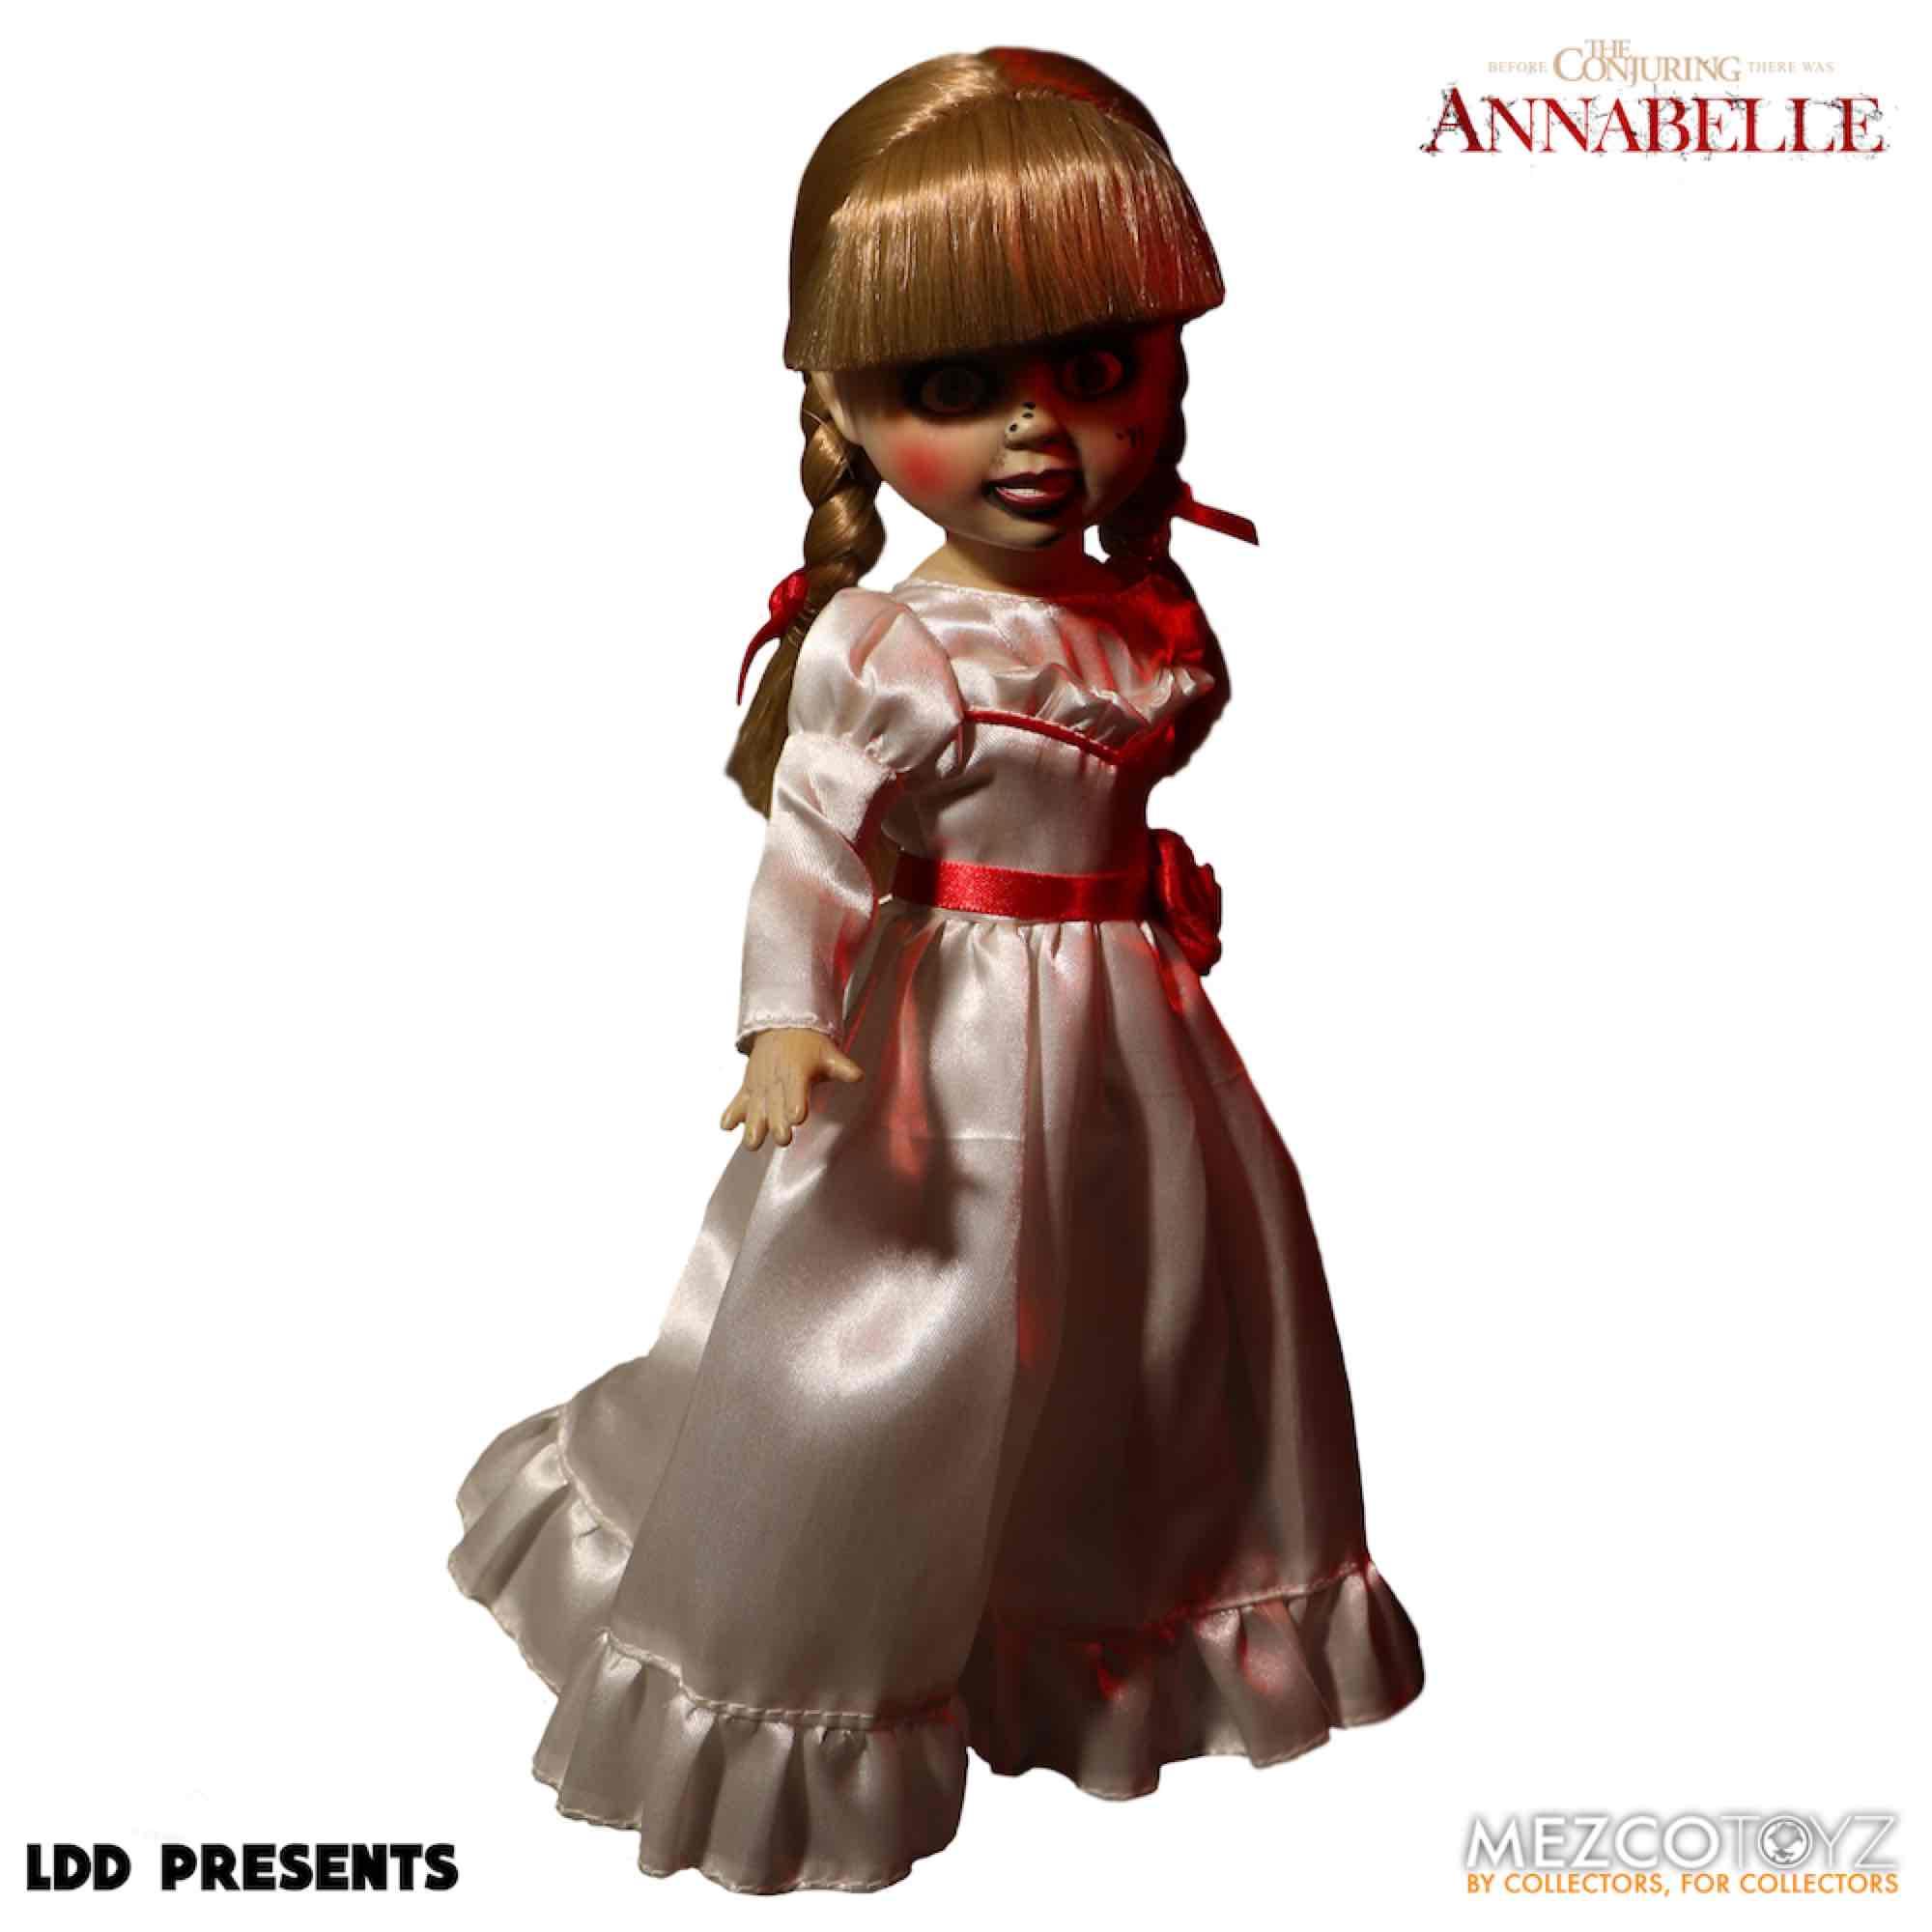 ANNABELLE MUÑECA 25.4 CM LIVING DEAD DOLL THE CONJURING